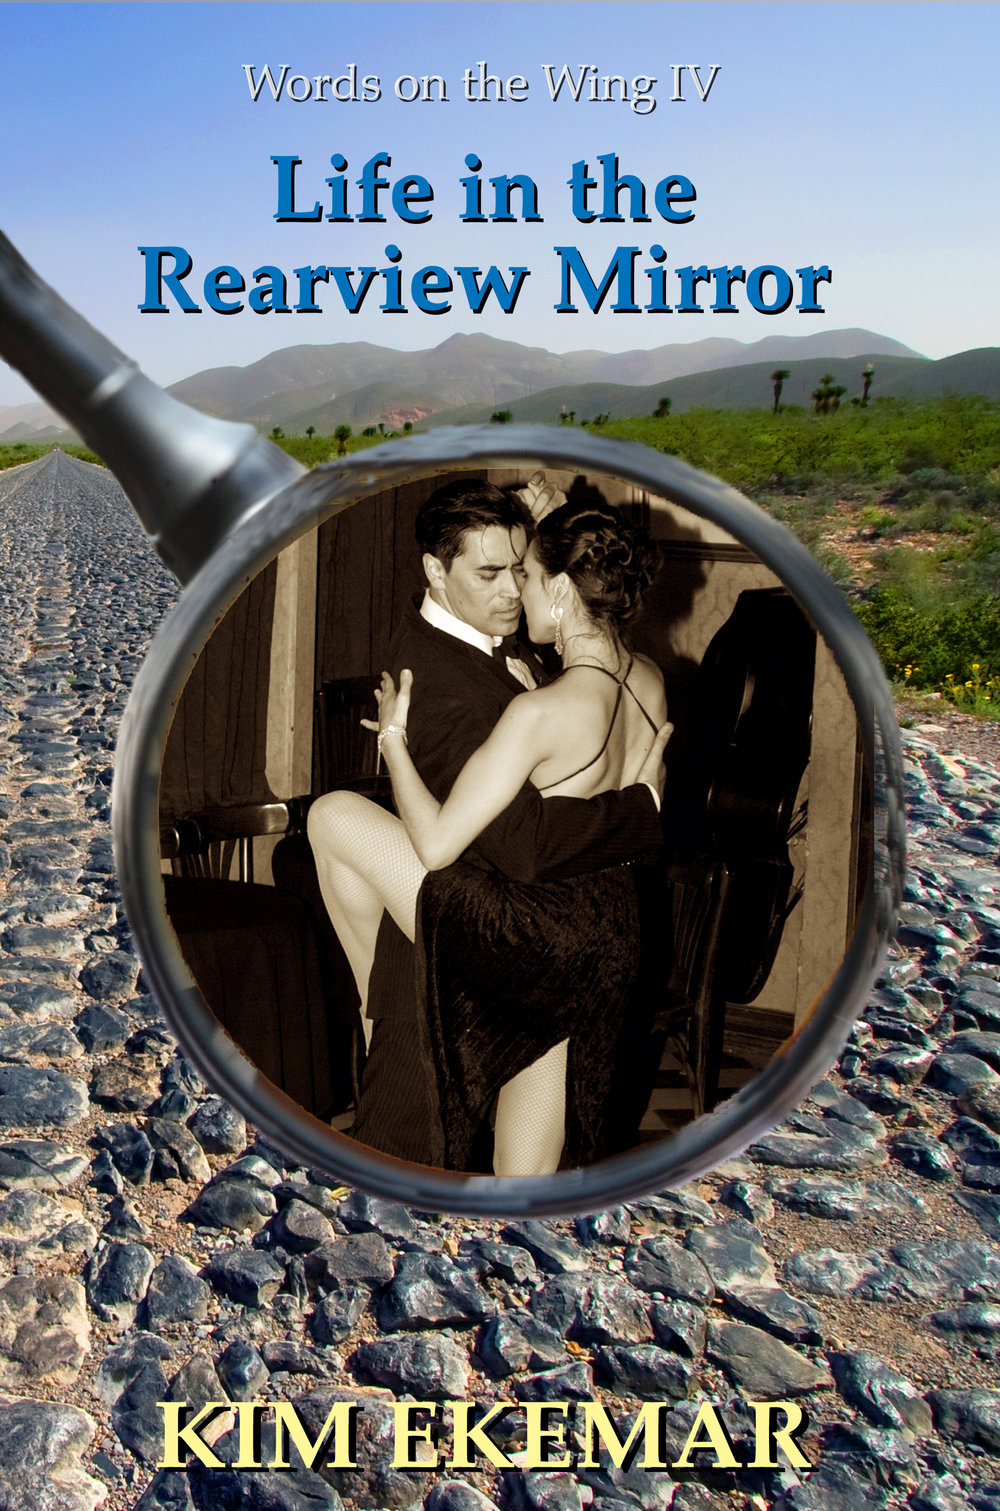 180529 EBOOK Life in the Rearview Mirror.jpg